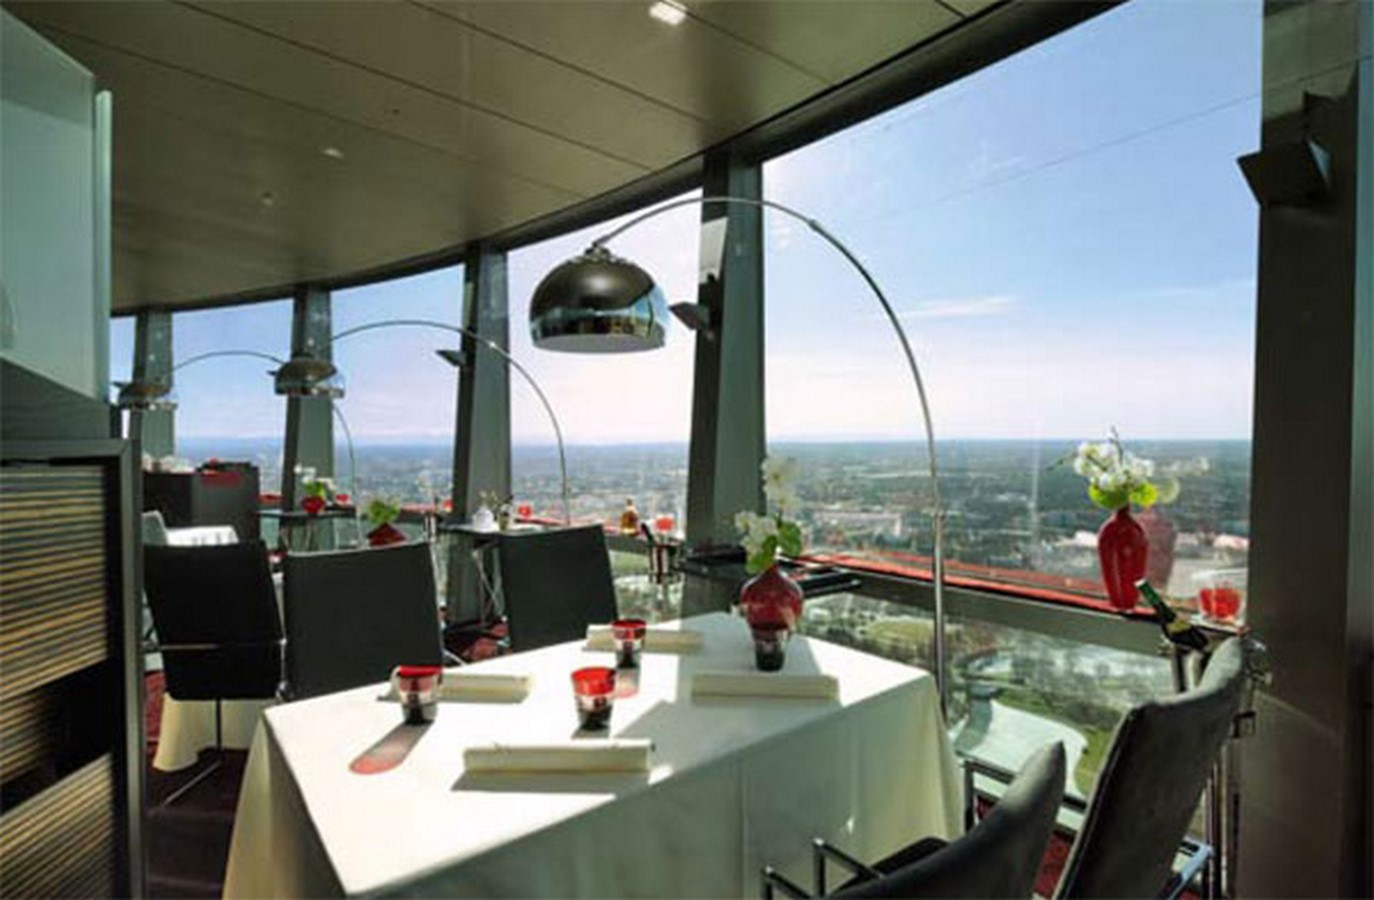 15 Examples of revolving hotels - Sheet8